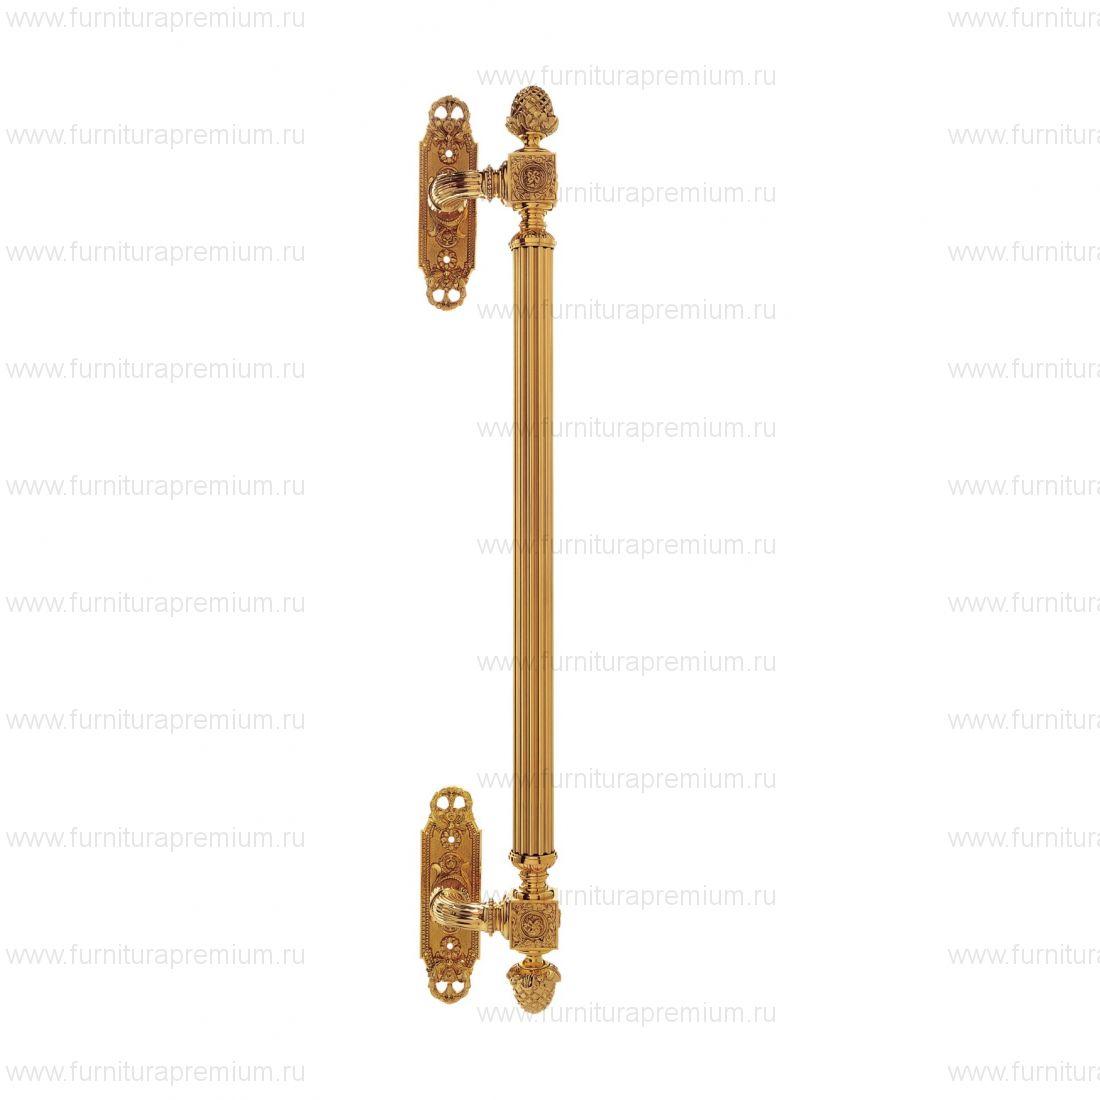 Ручка-скоба Enrico Cassina C49000. Длина 788 мм.